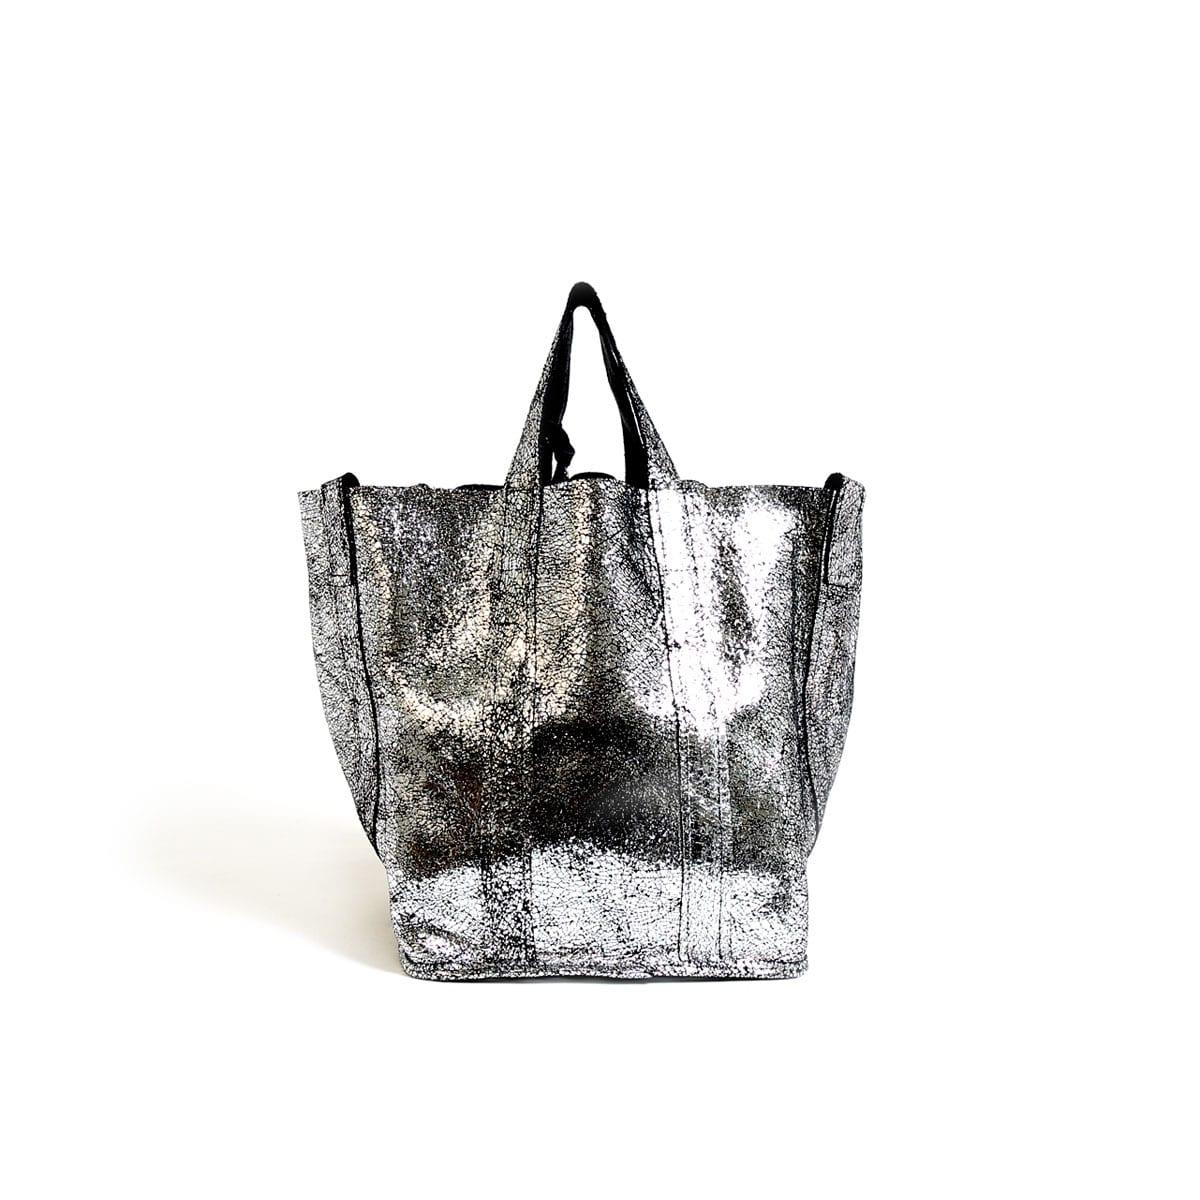 8a00fd37dad98 Frida Small Tote Floater Black Silver – Lumi Accessories